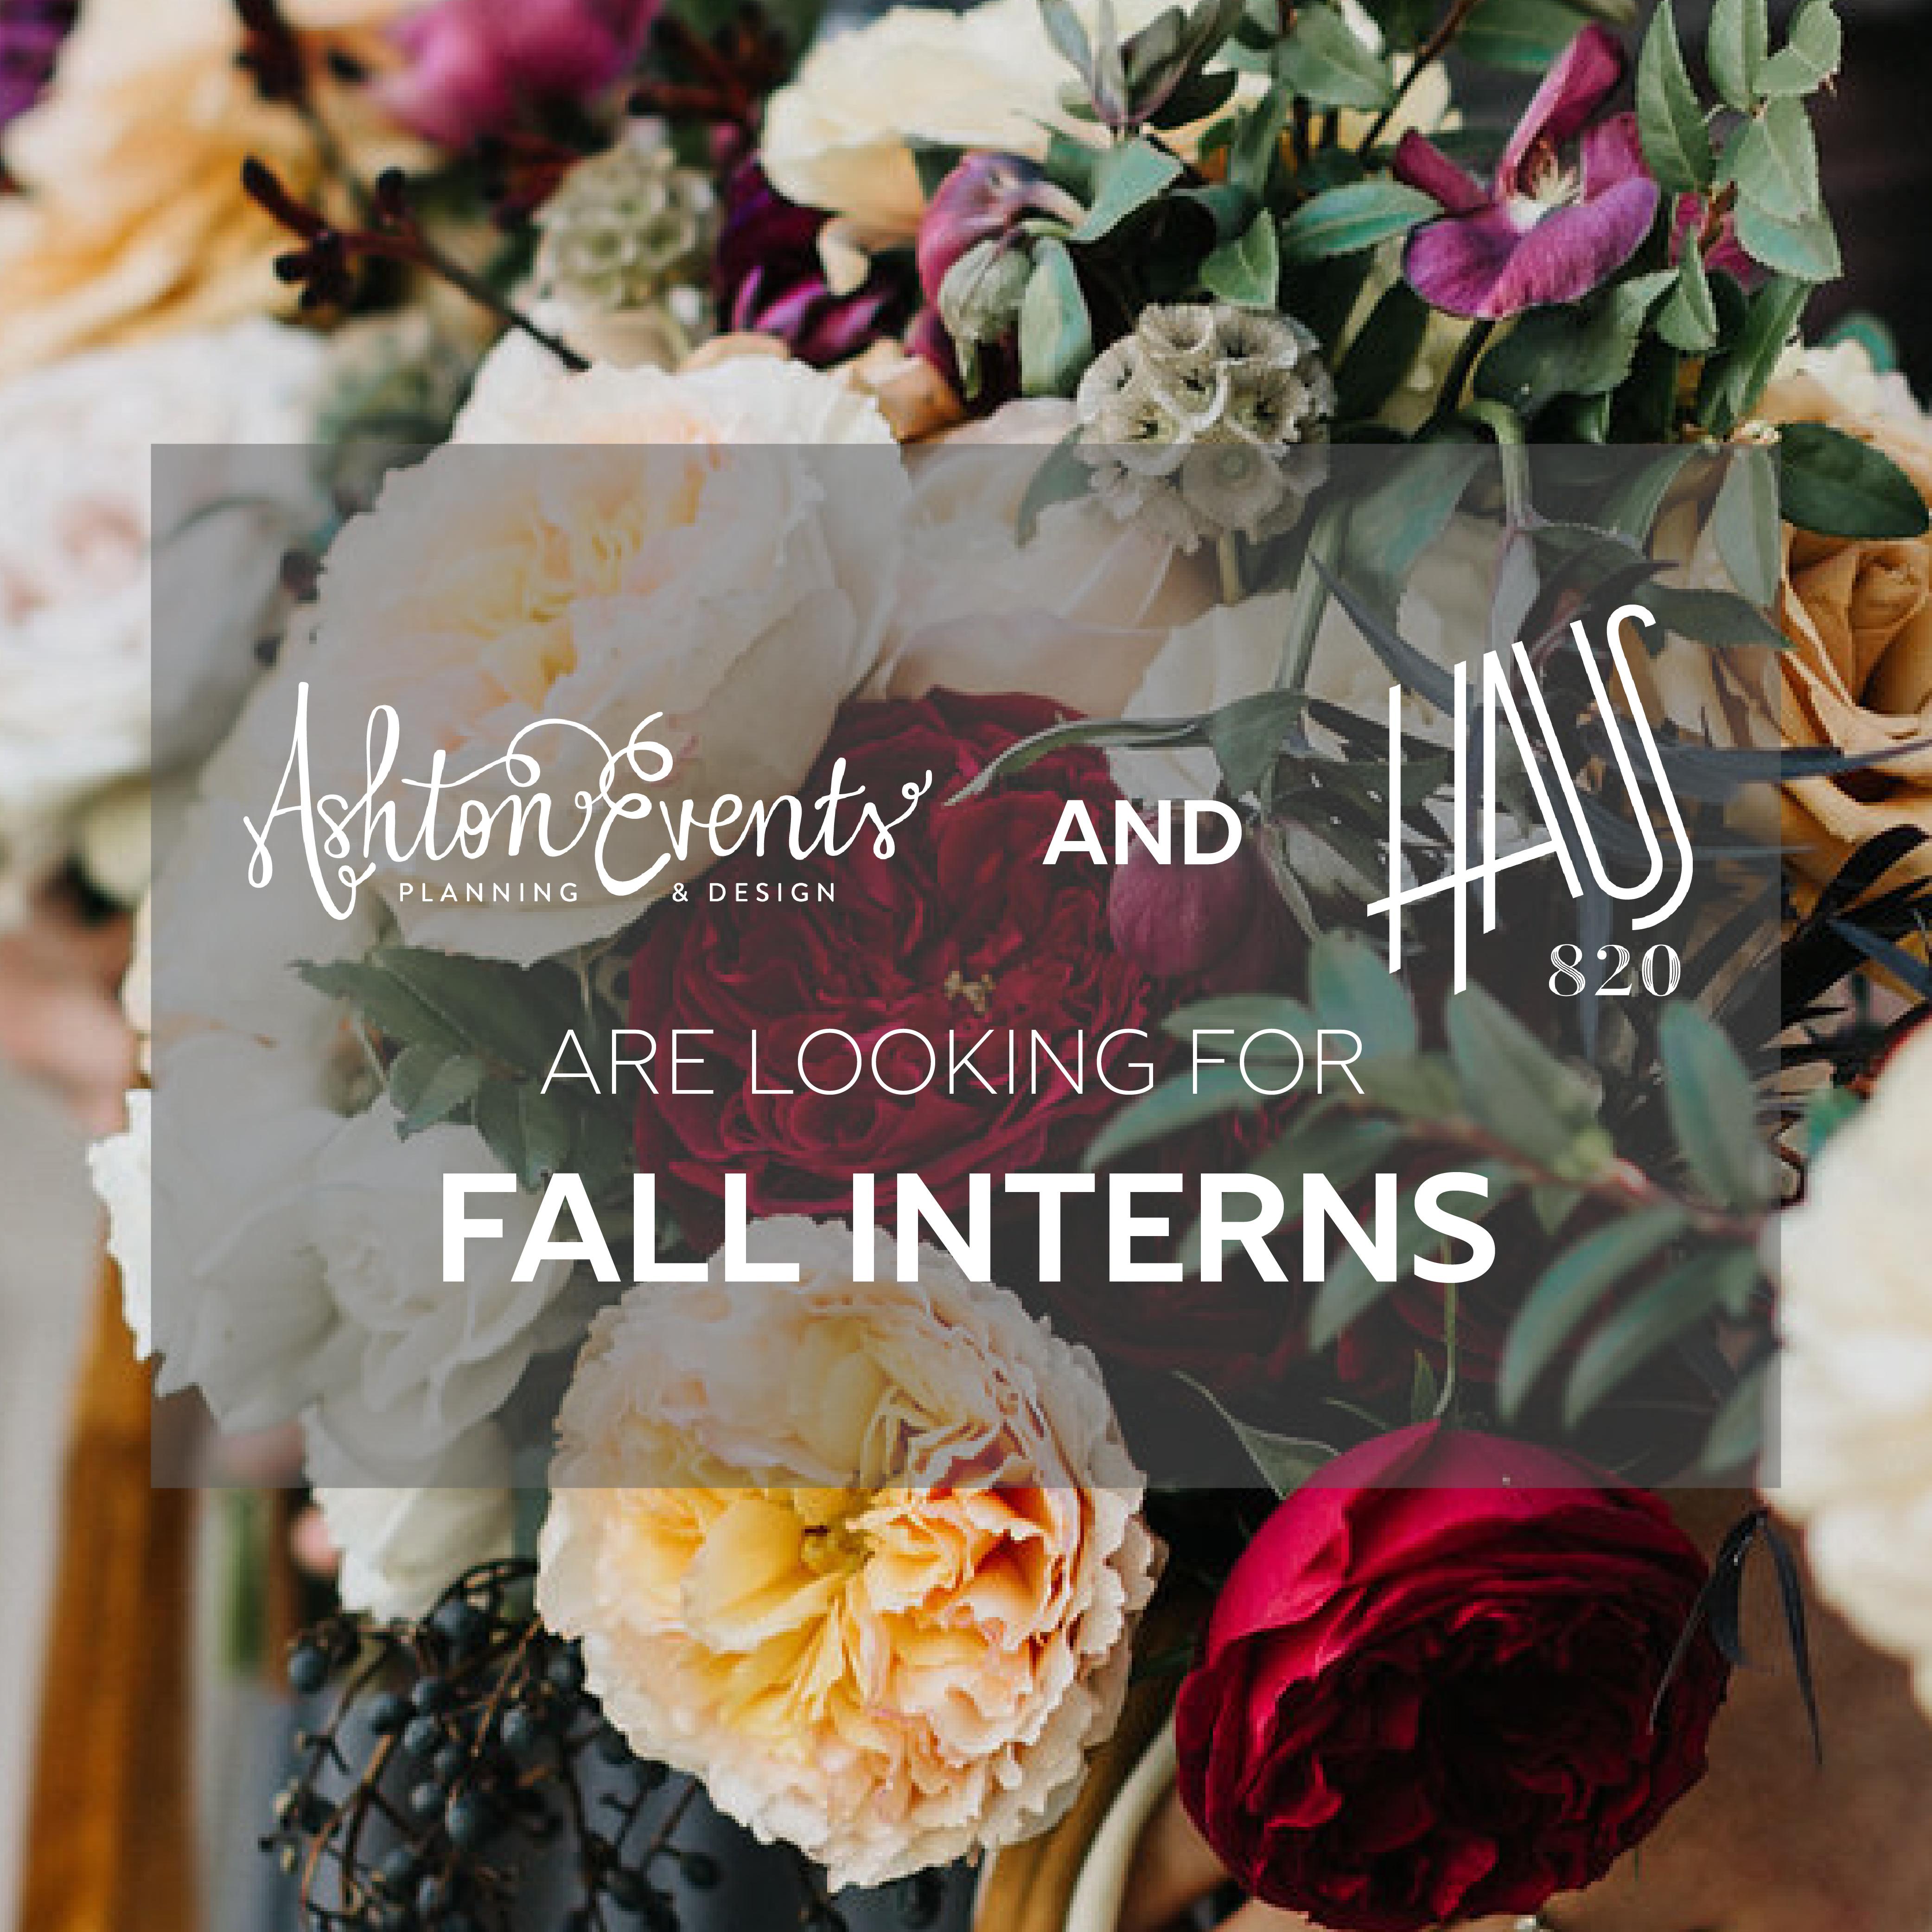 We're Hiring! Fall 2018 Internship